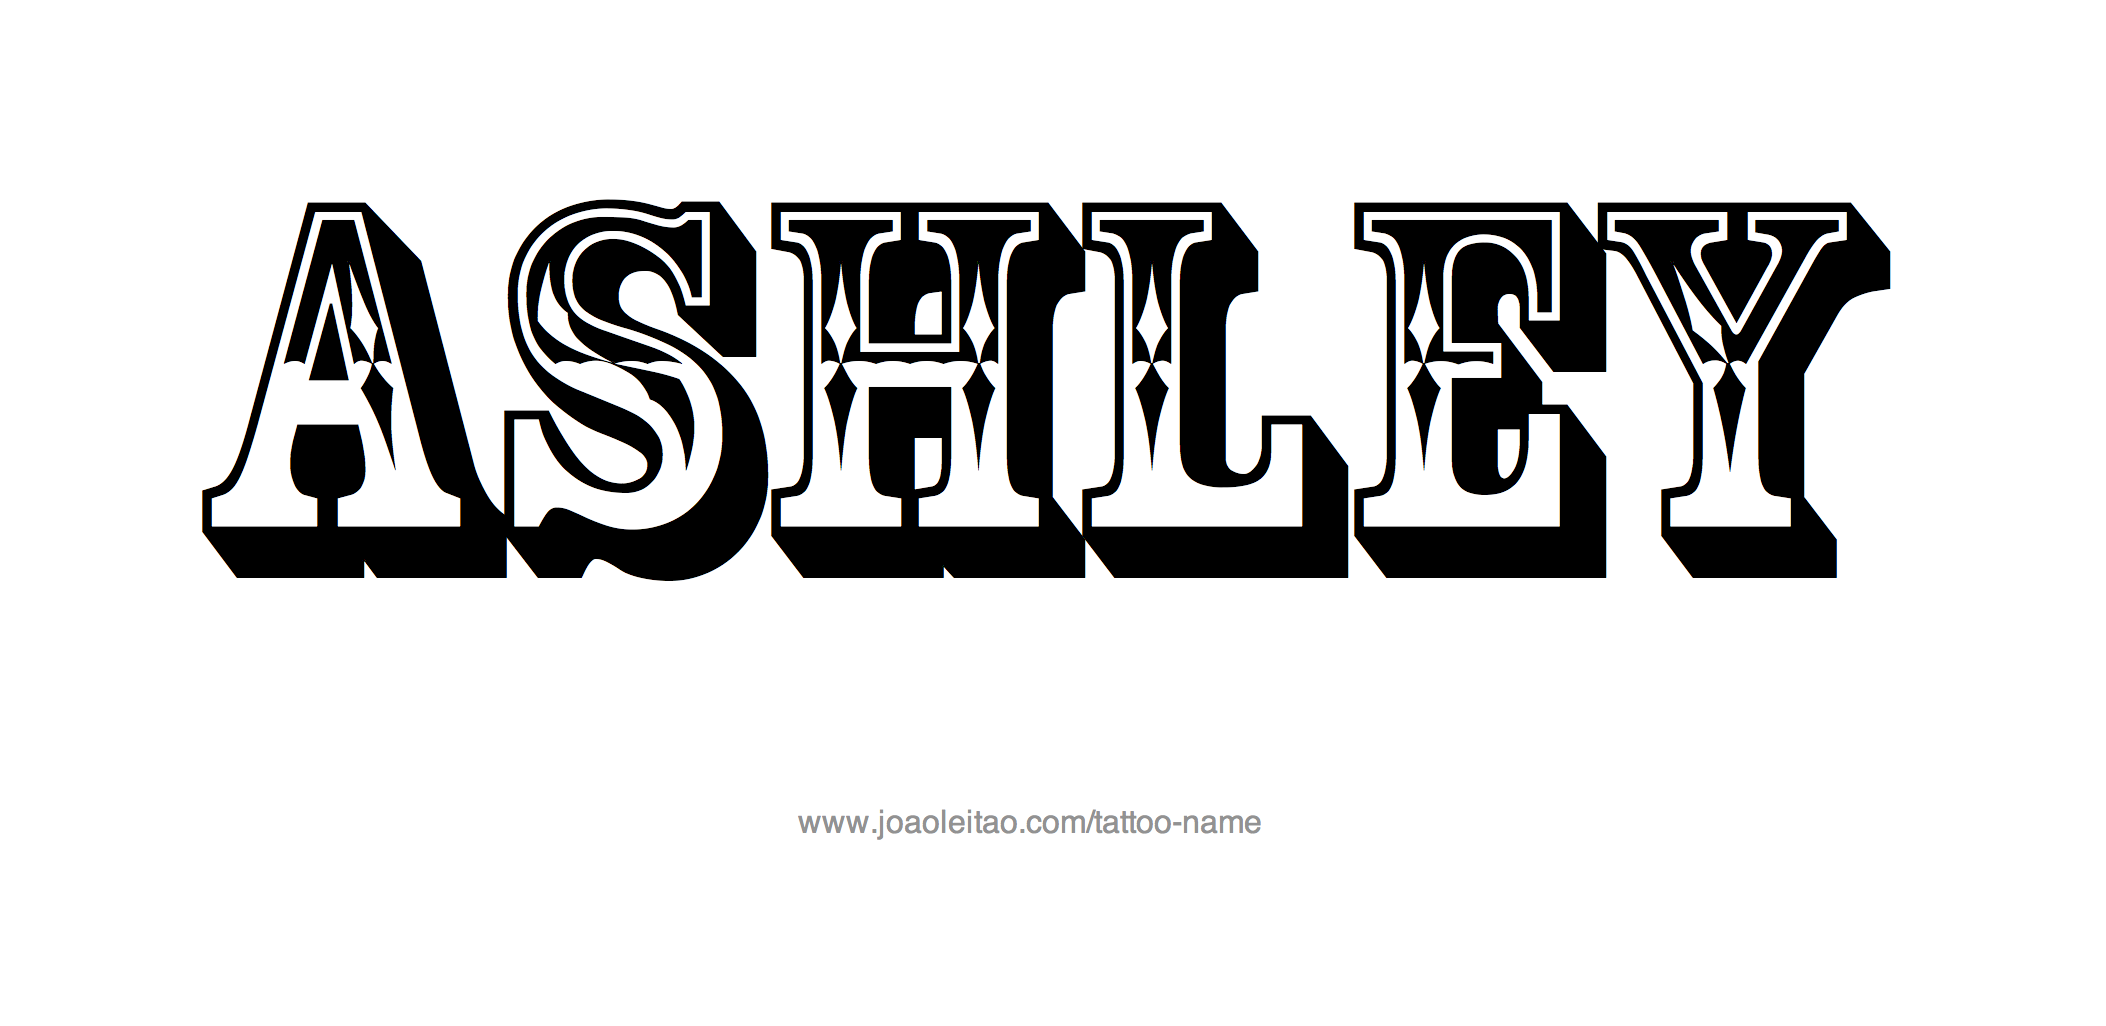 Ashley Name Tattoo Designs